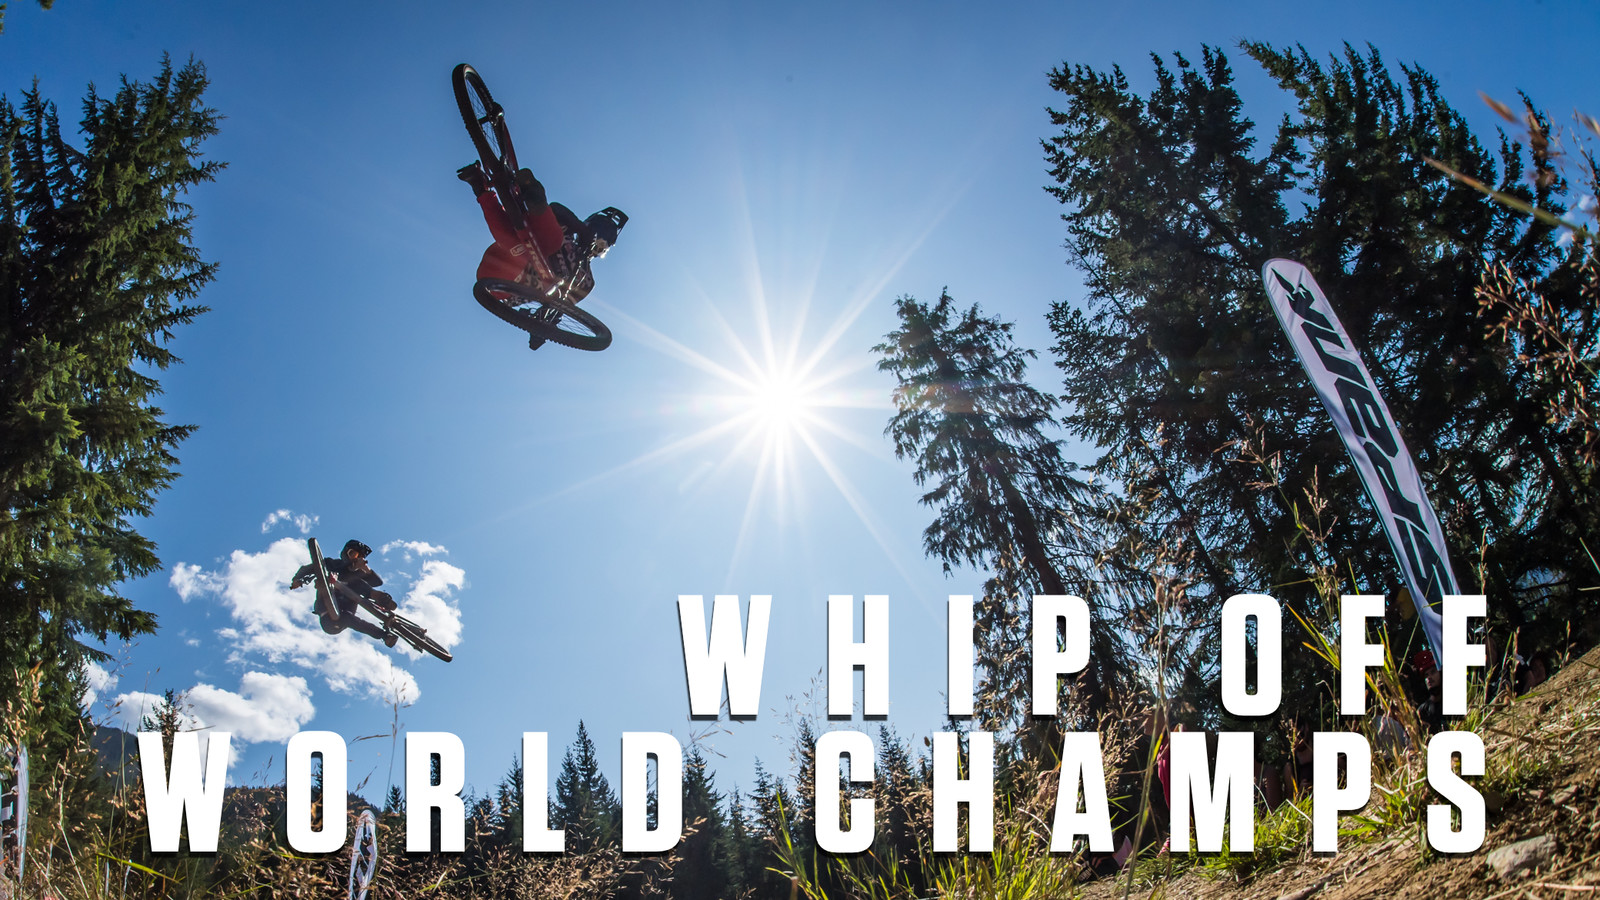 2019 Whip-Off World Champs Crankworx Whistler - 2019 Whip-Off World Champs Crankworx Whistler - Mountain Biking Pictures - Vital MTB